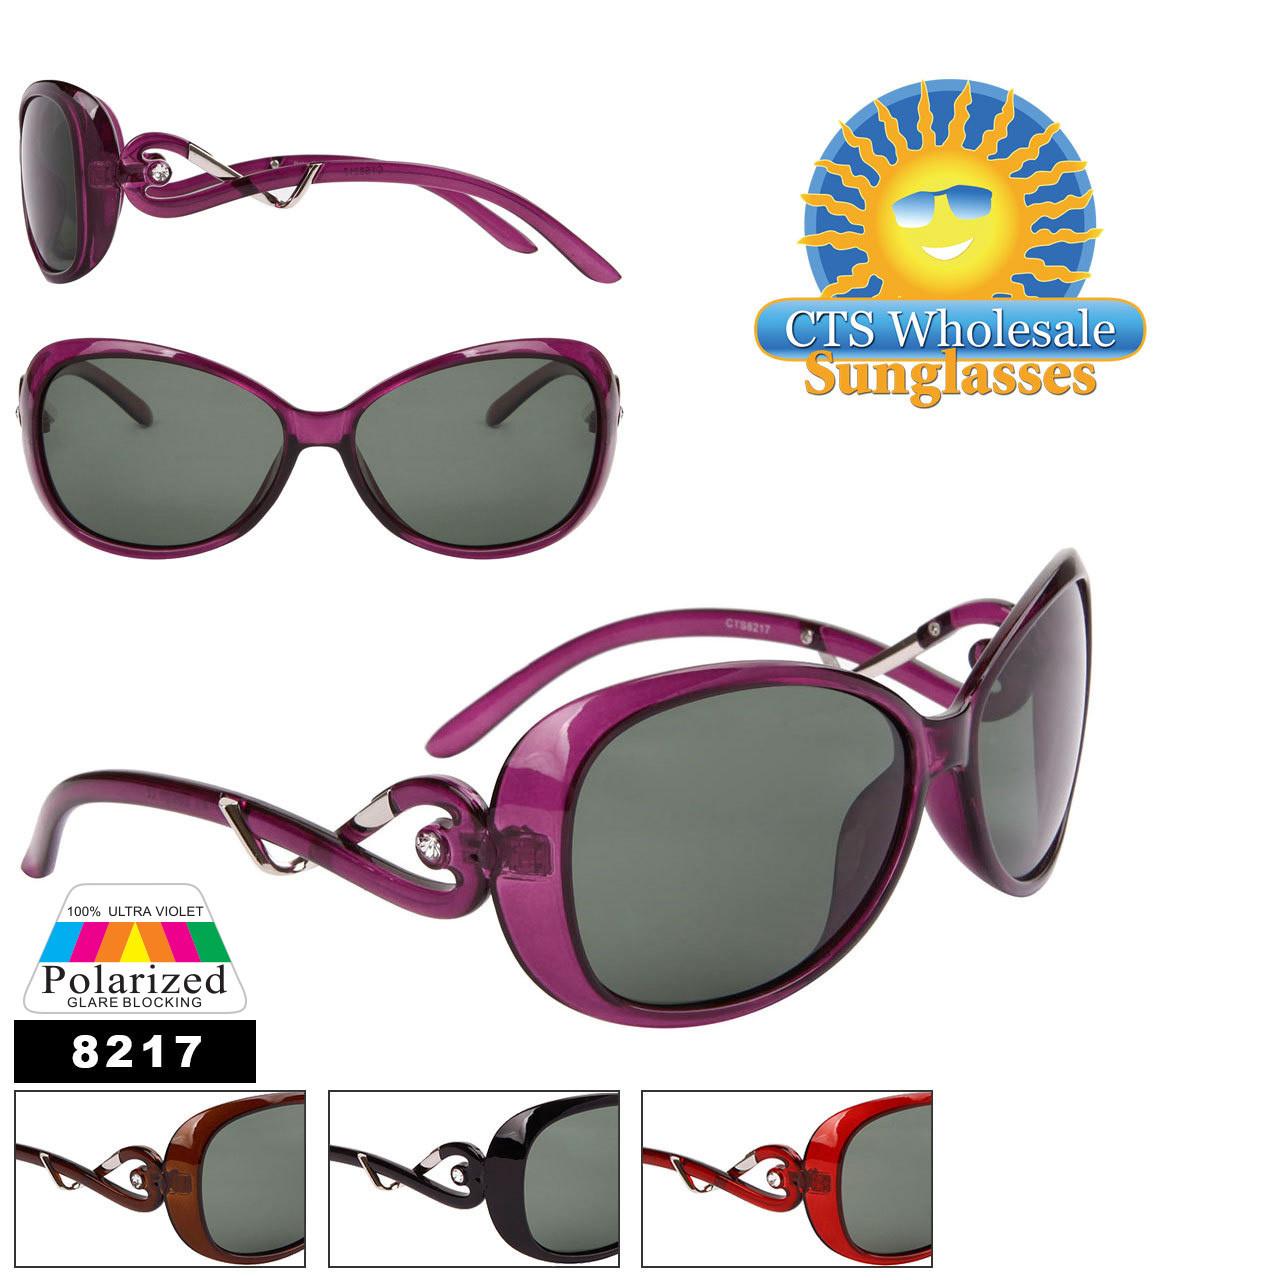 Women's Polarized Sunglasses Wholesale 8217